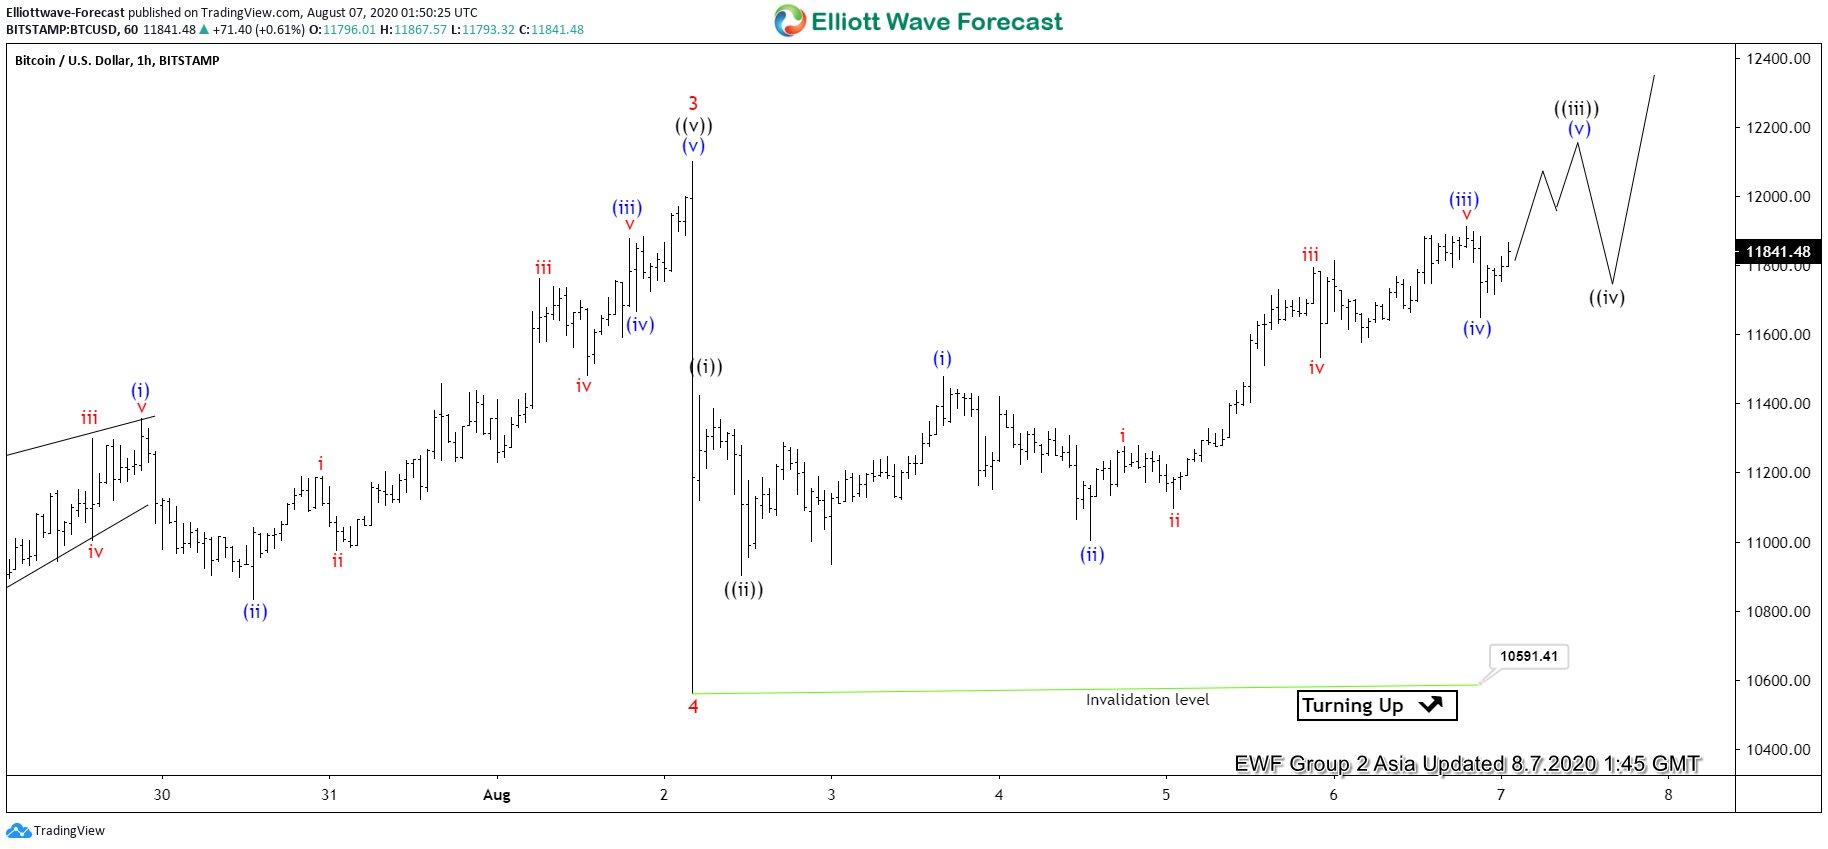 Elliott Wave View: Bitcoin Impulsive Rally In Progress